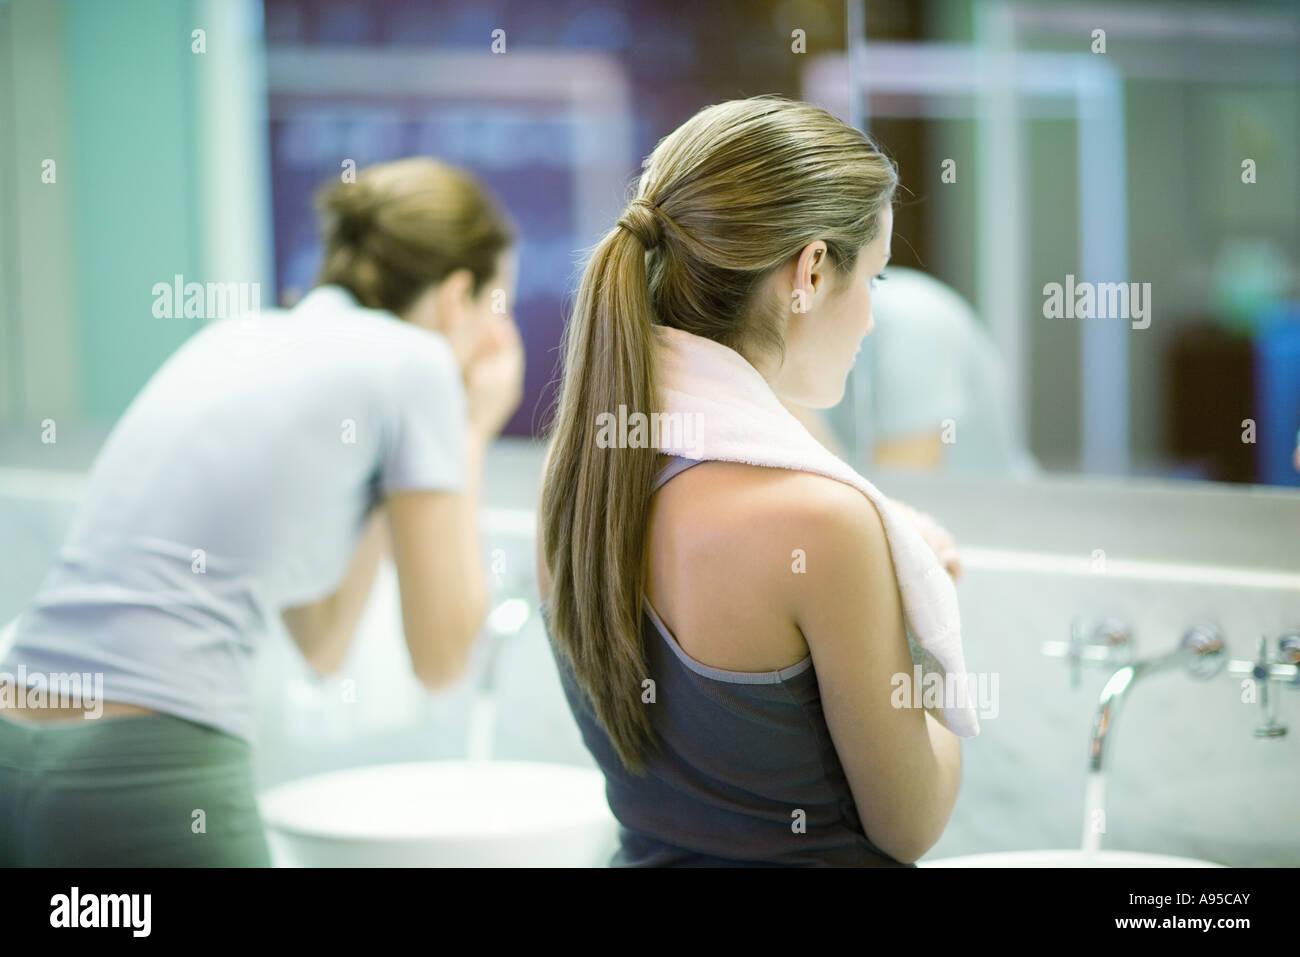 Women in public restroom, facing mirror - Stock Image